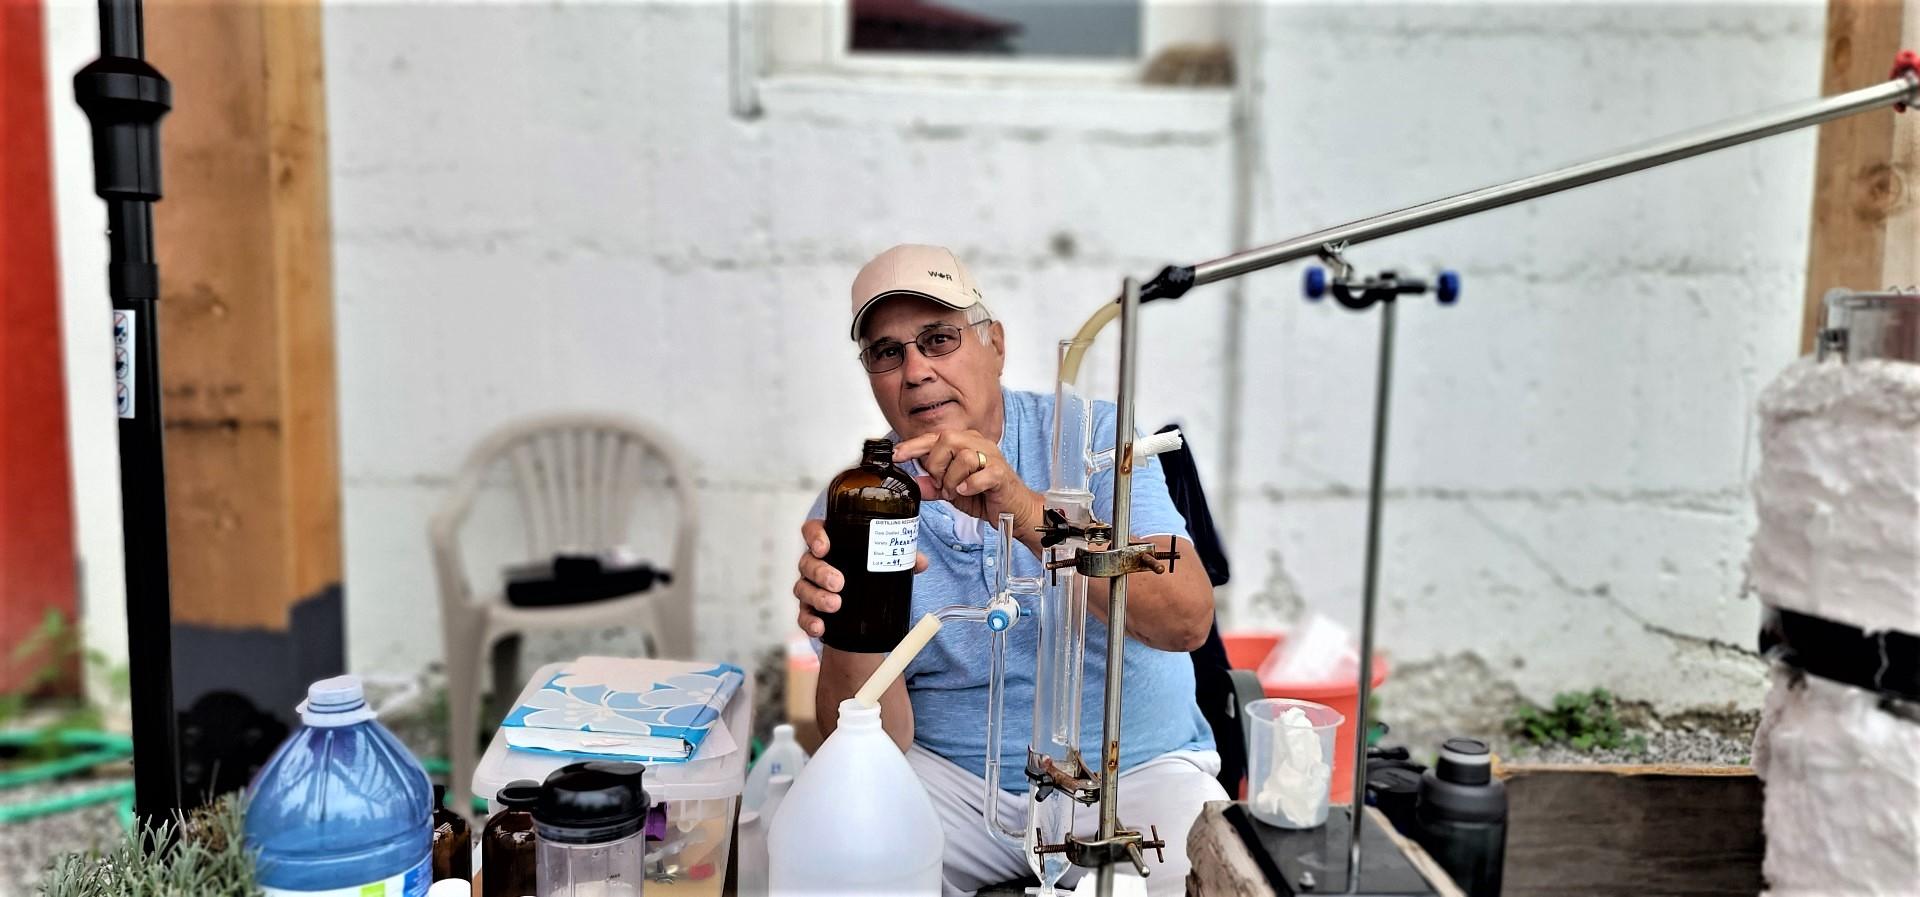 Apple Hill Lavender Farm owner showing lavender oil bottle